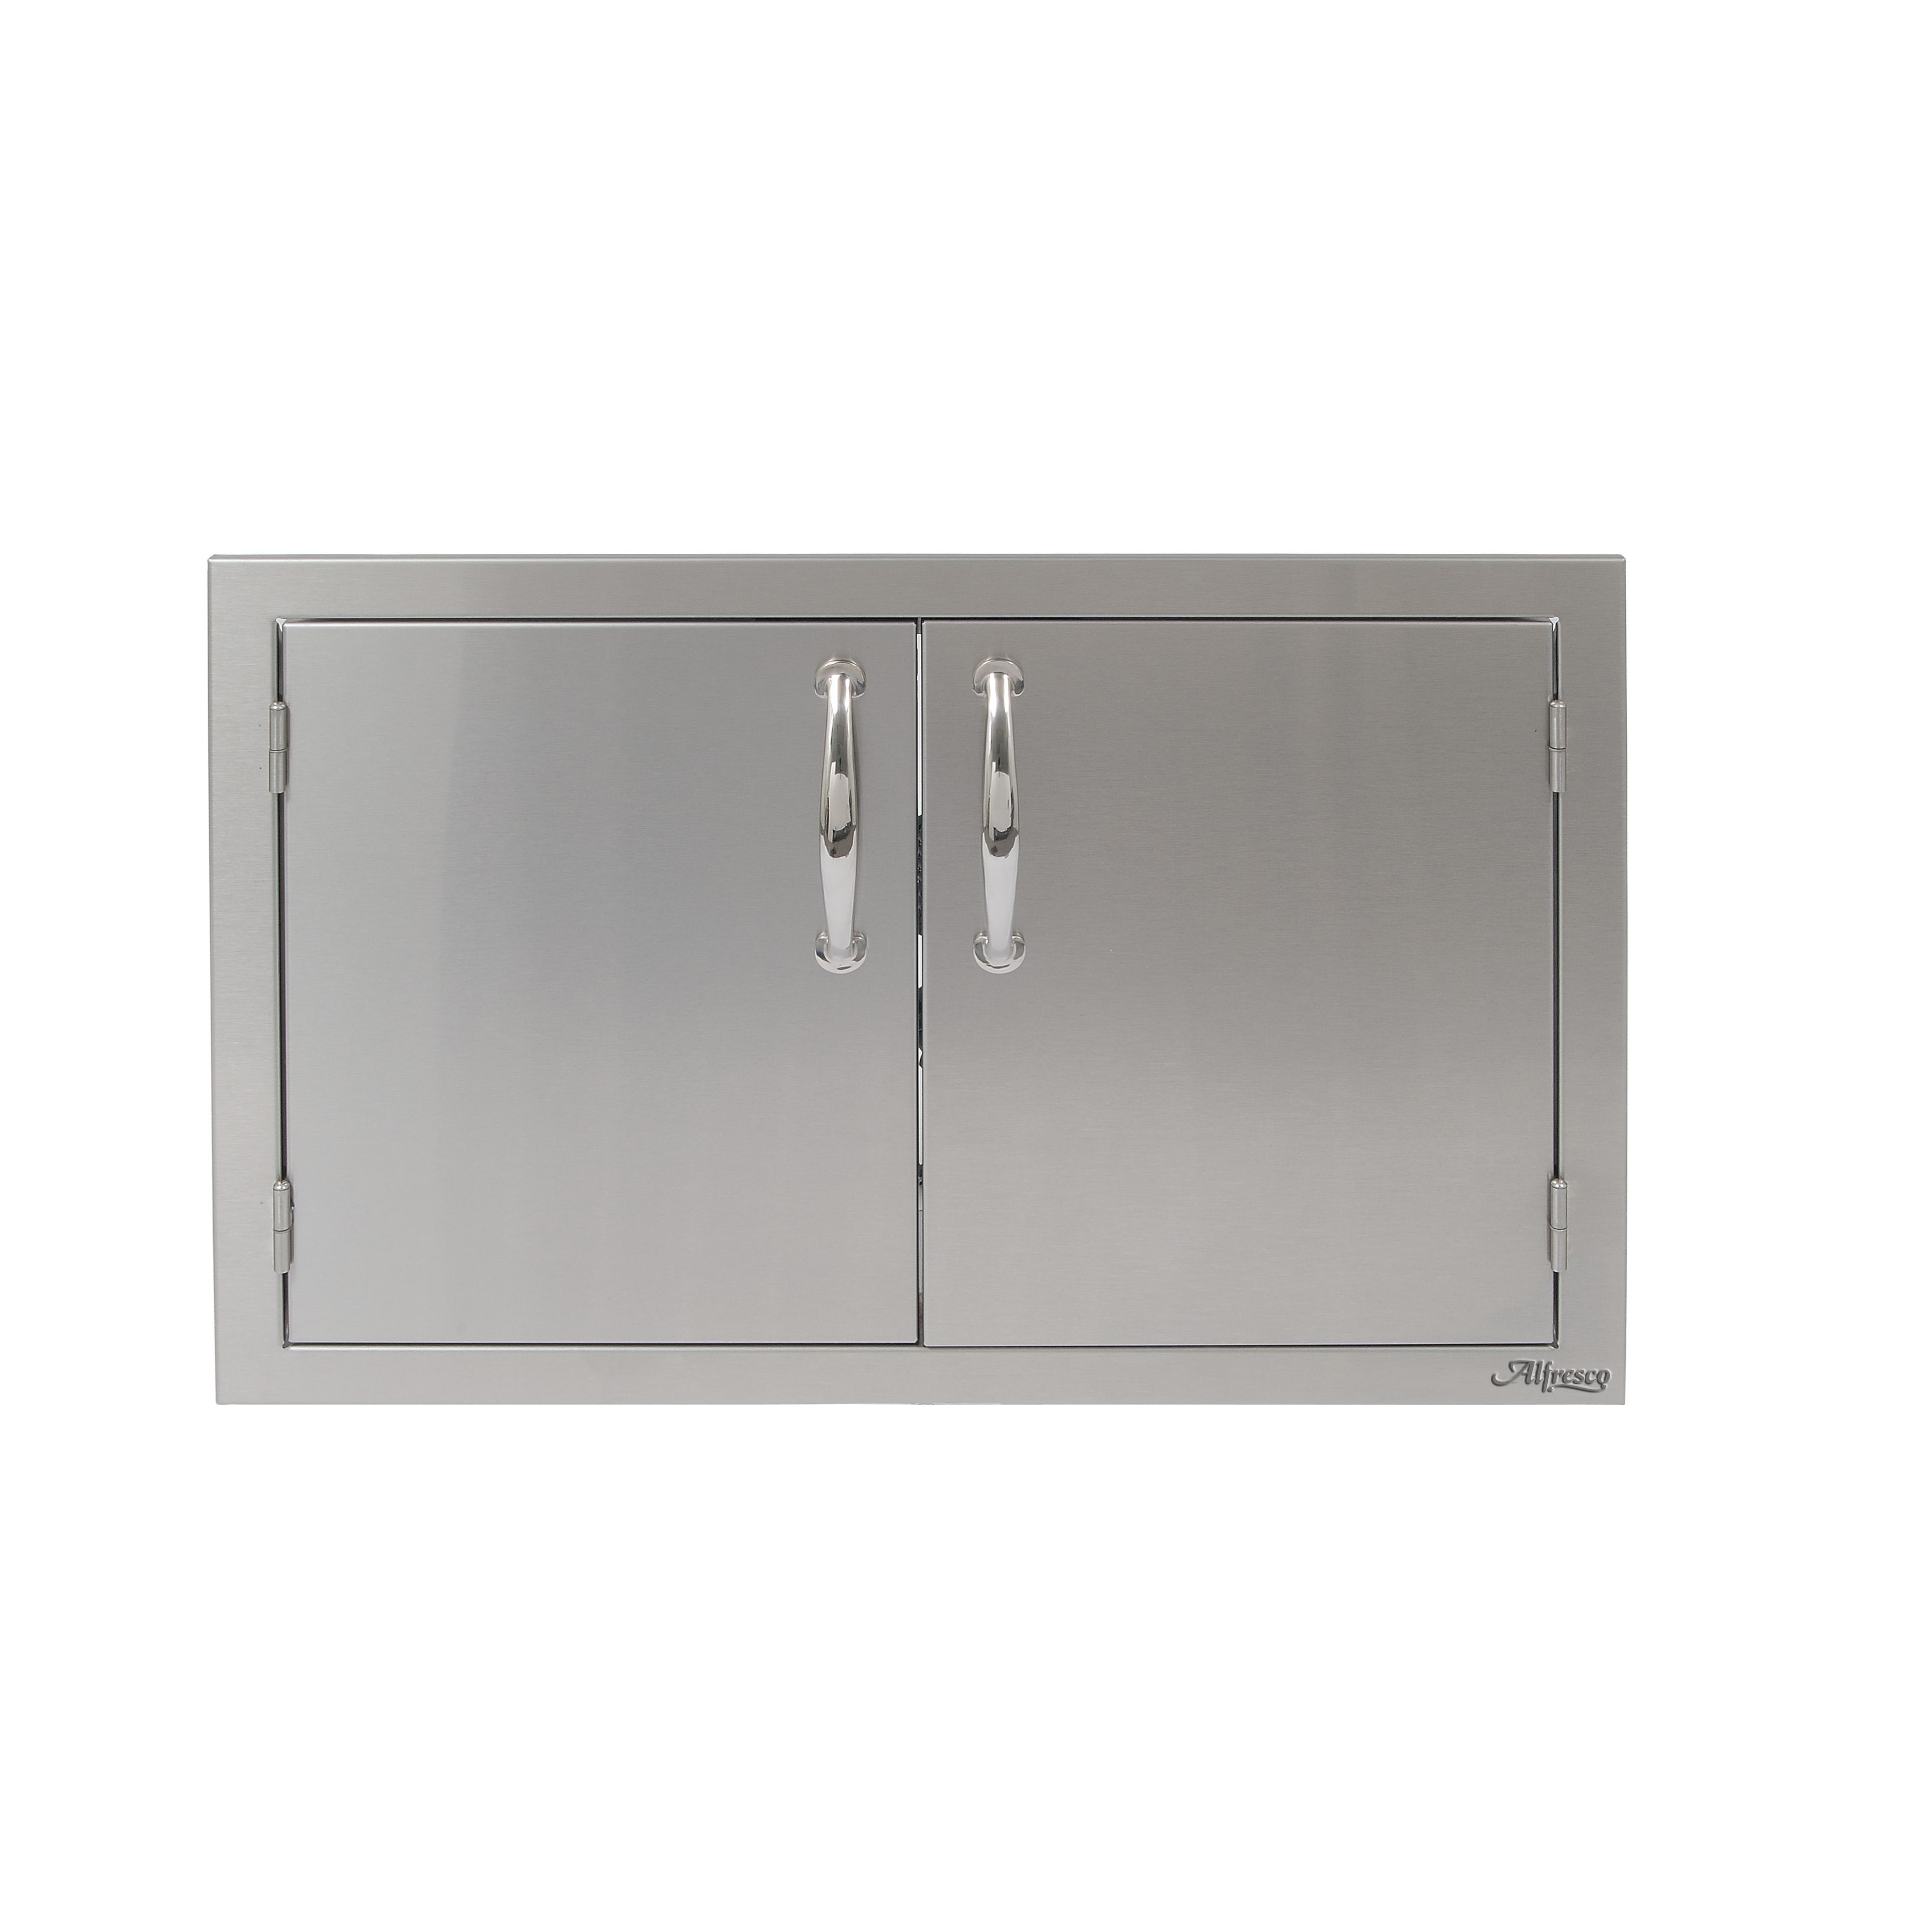 3872 #6A6A61 Alfresco 30 In. Stainless Steel Double Door TheGrillFather.com image Double Metal Doors 43633872